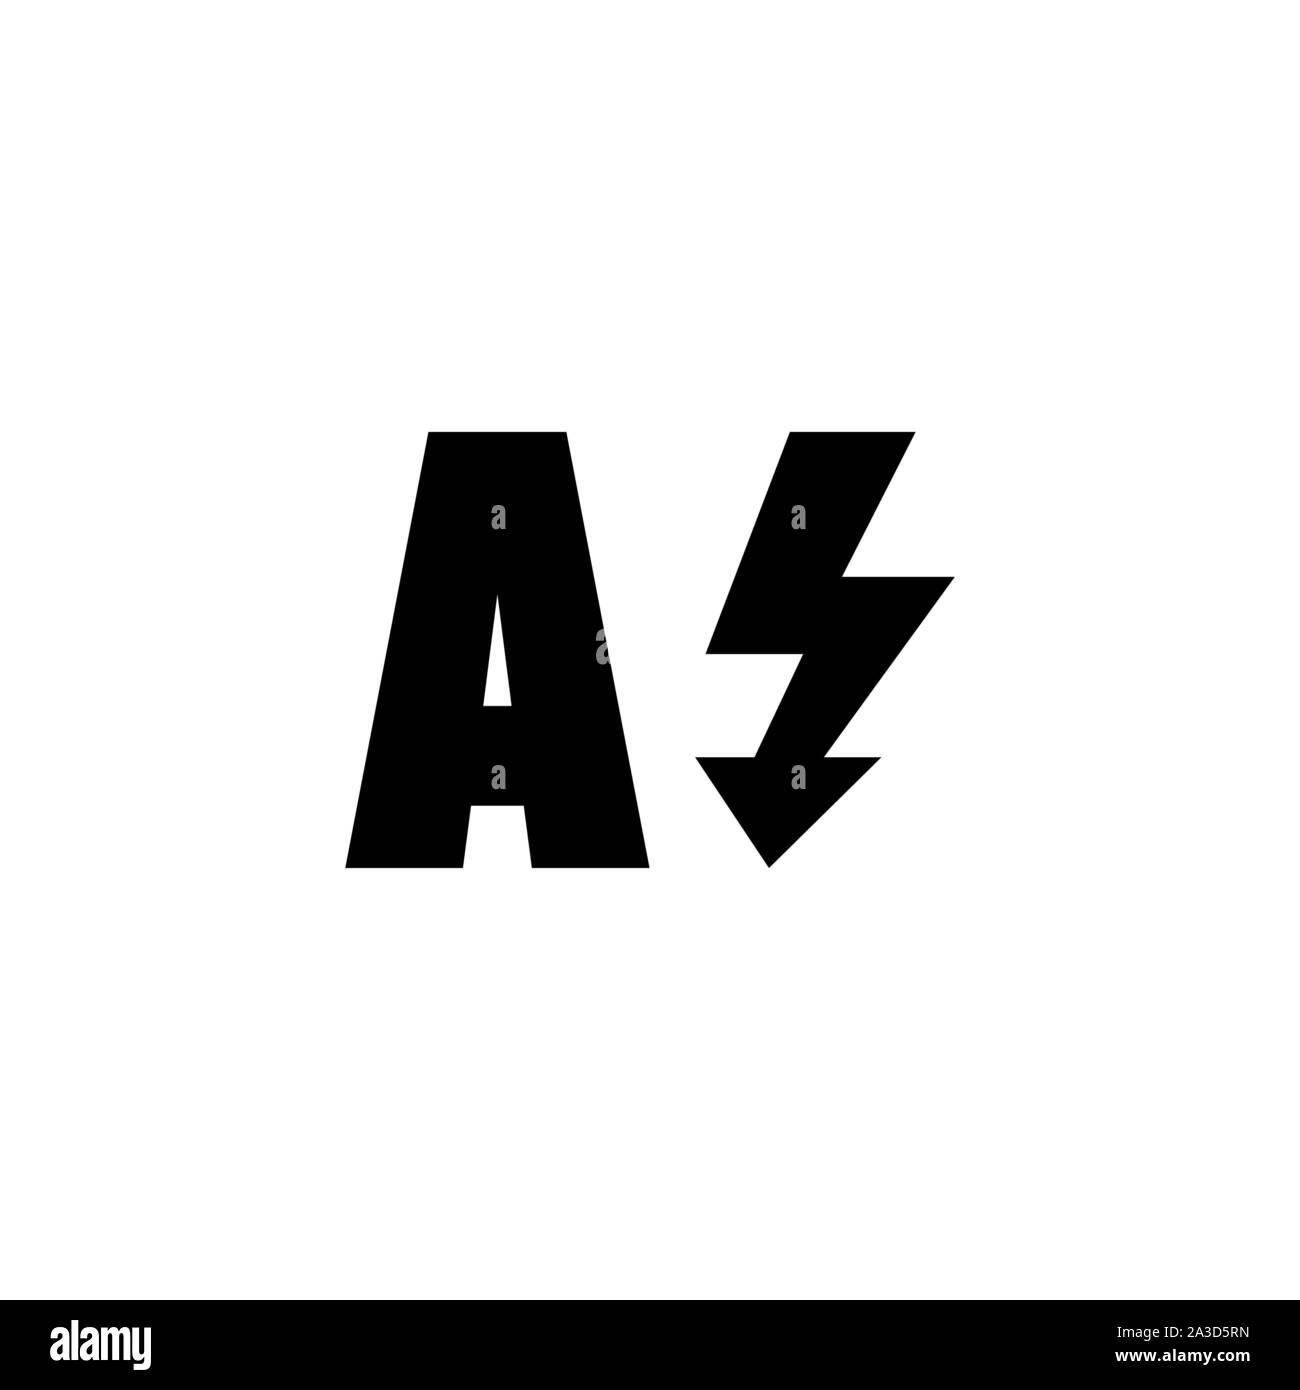 Auto Flash, Light Camera Mode. Flat Vector Icon illustration. Simple black symbol on white background. Auto Flash, Light Camera Mode sign design templ Stock Vector